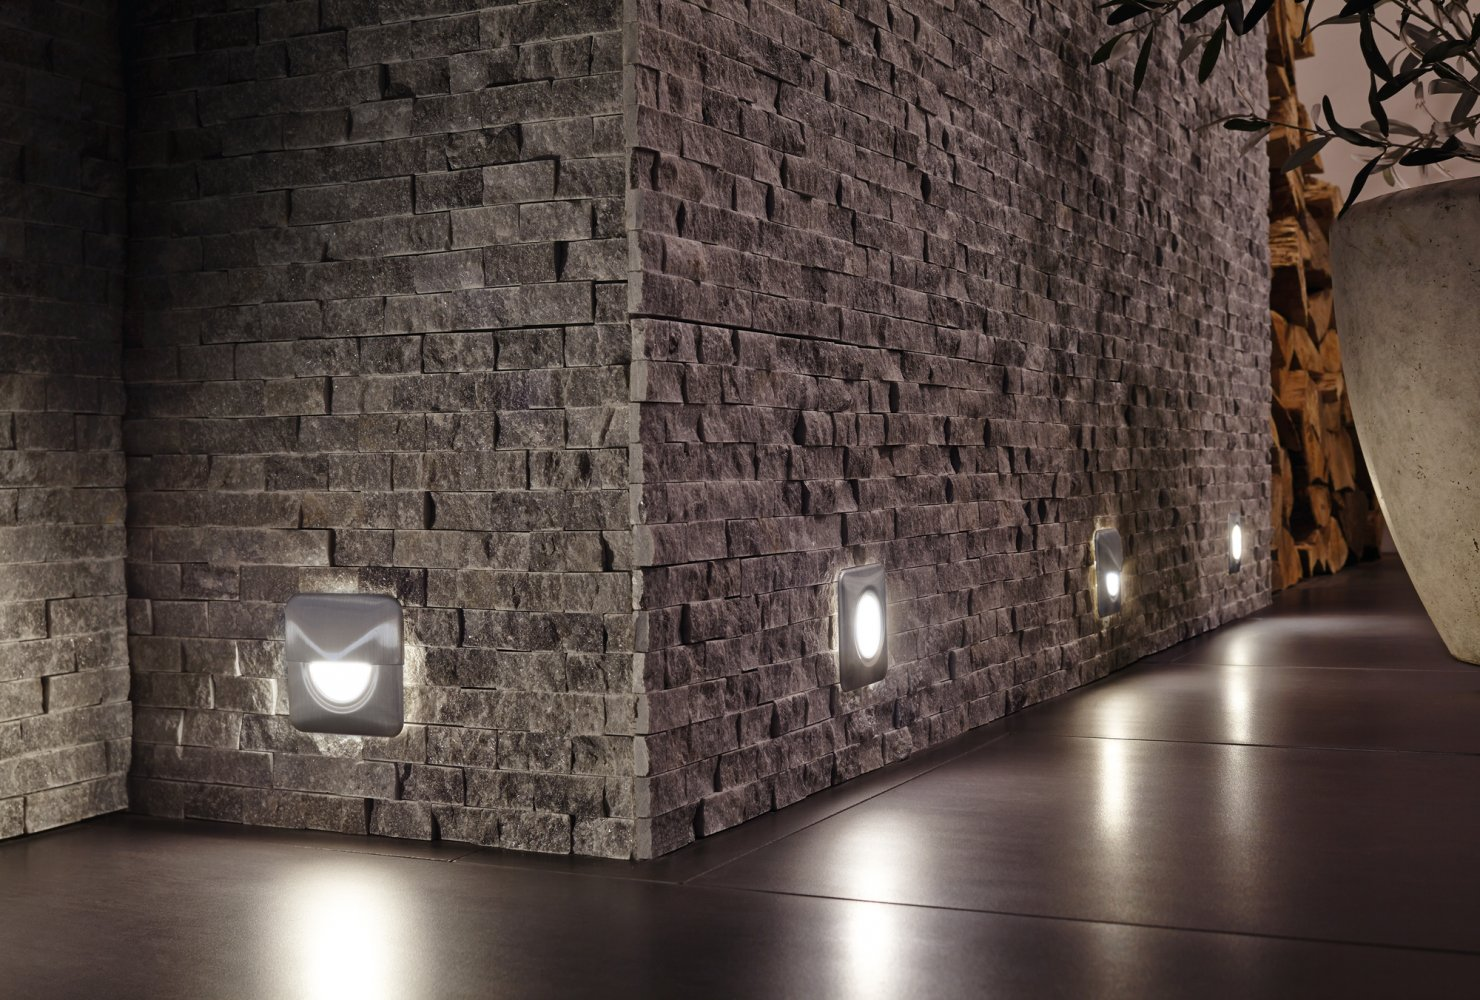 paulmann no 93740 einbauleuchten set special line ip65 led opal warmwei 1er set eur 22 39. Black Bedroom Furniture Sets. Home Design Ideas